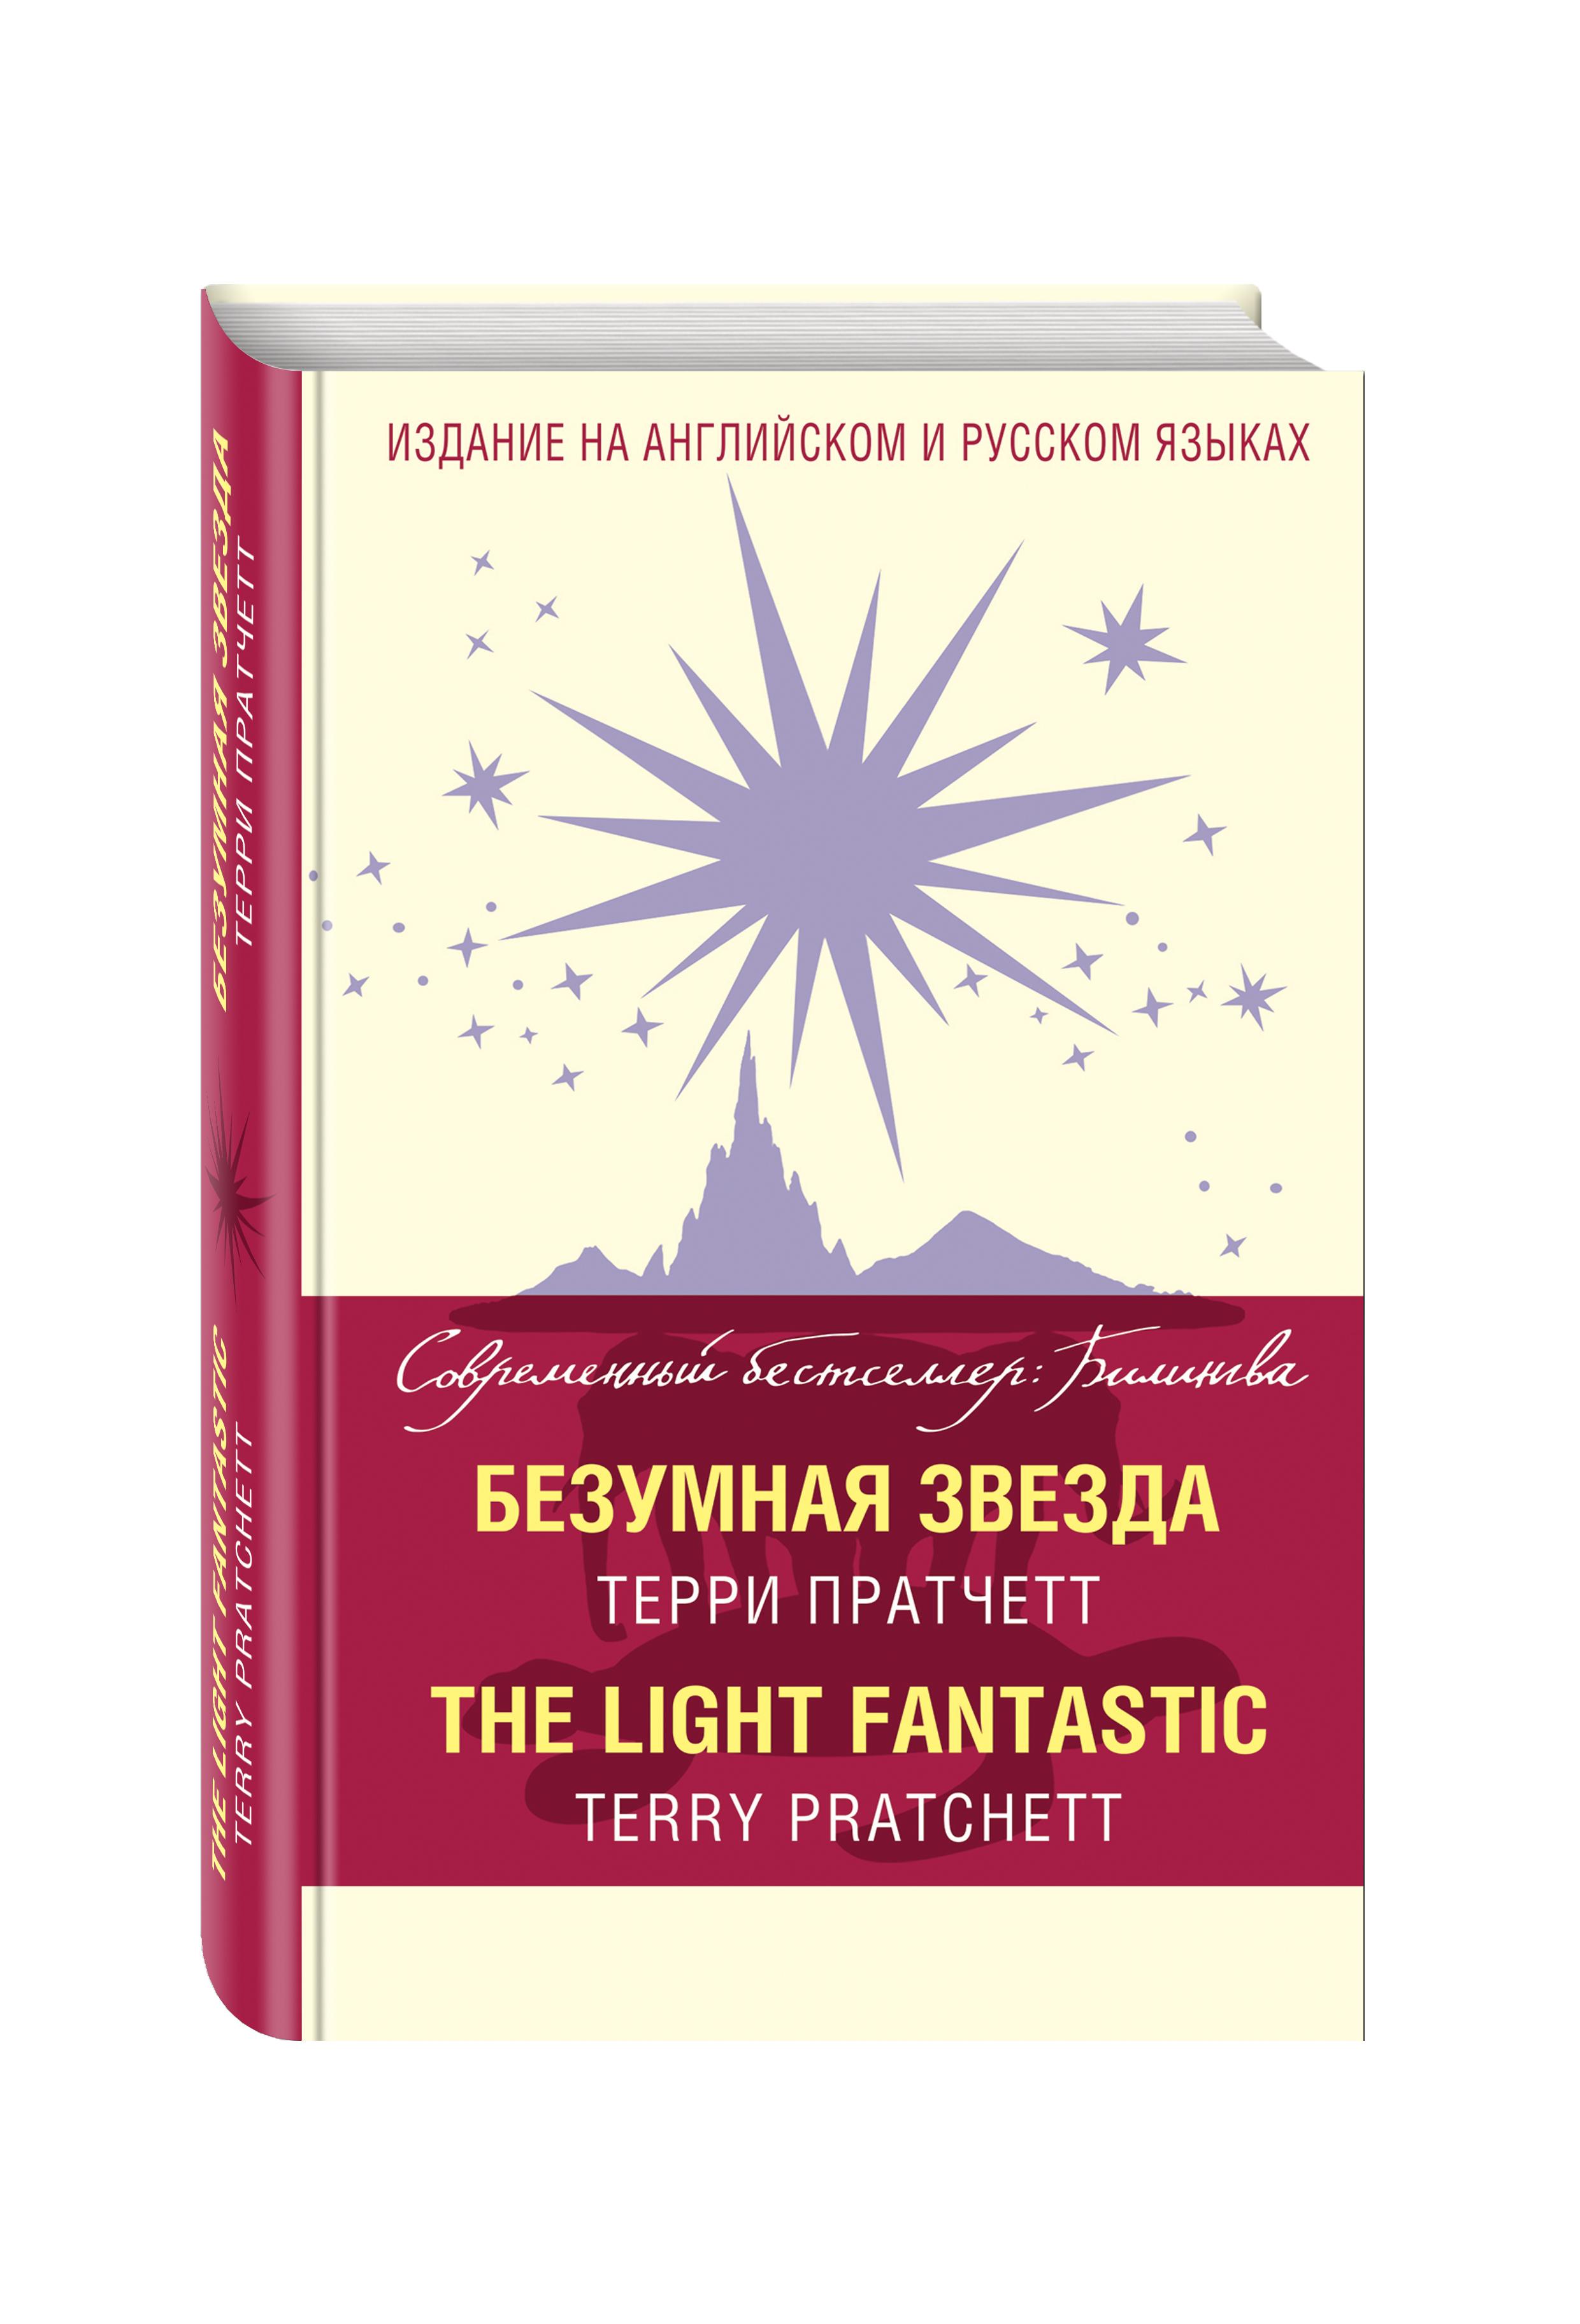 Терри Пратчетт Безумная звезда = The Light Fantastic пратчетт т безумная звезда the light fantastic